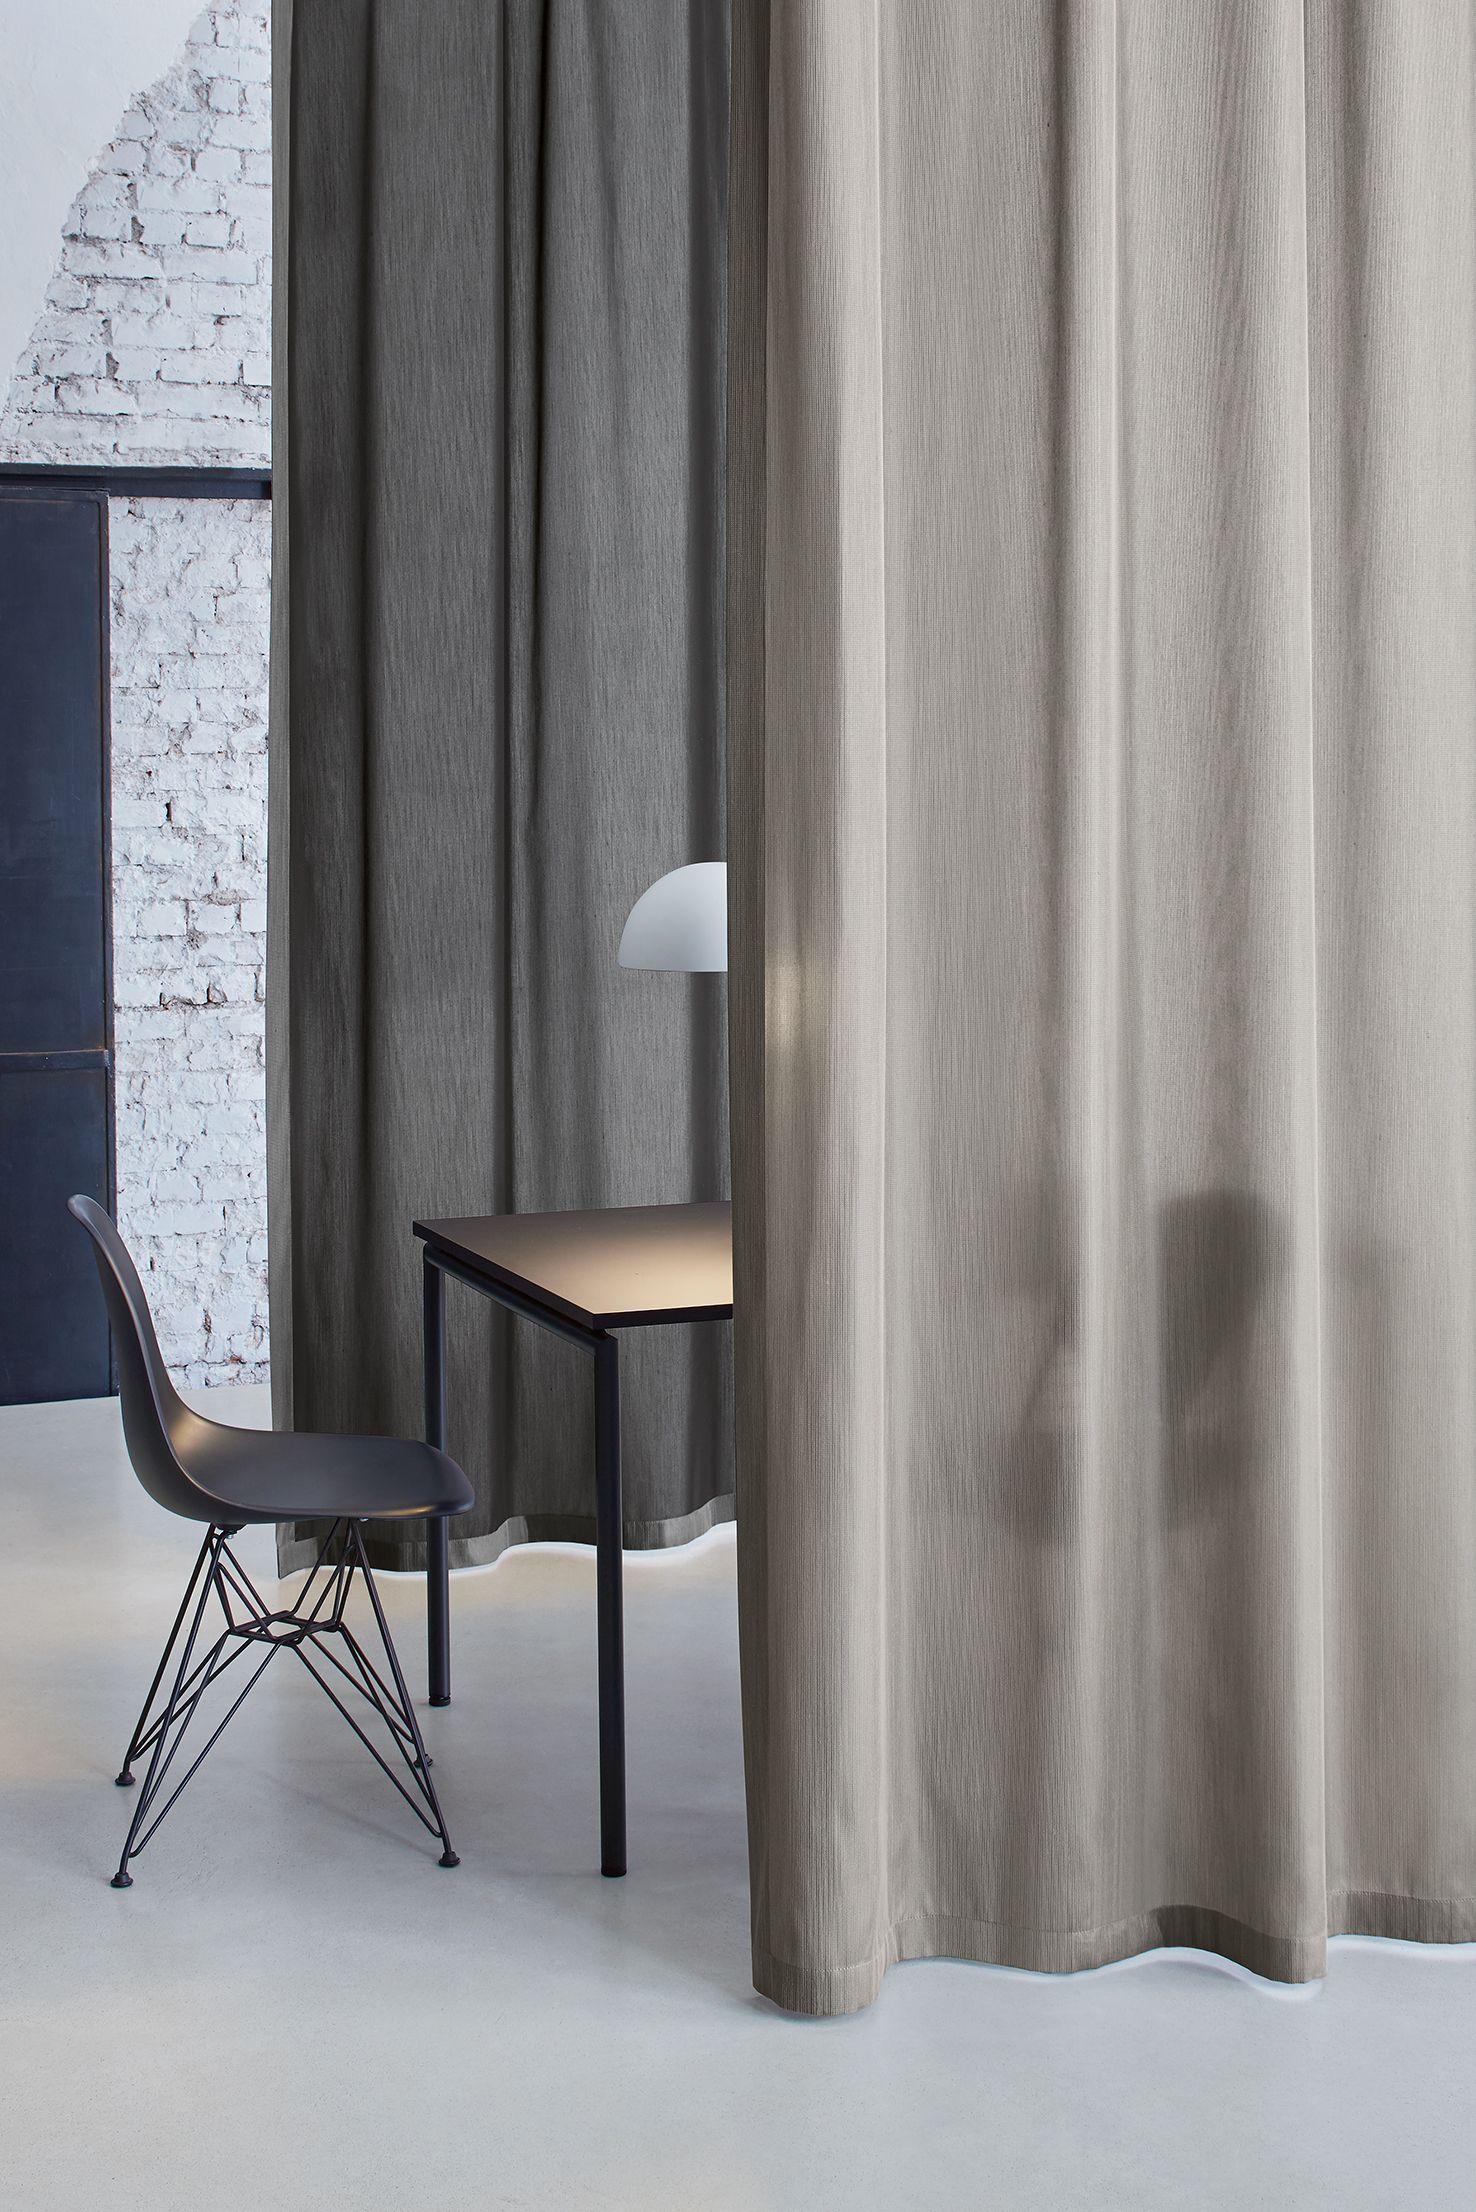 Silent Light Curtain Divider Interior Design Bedroom Teenage Room Acoustics